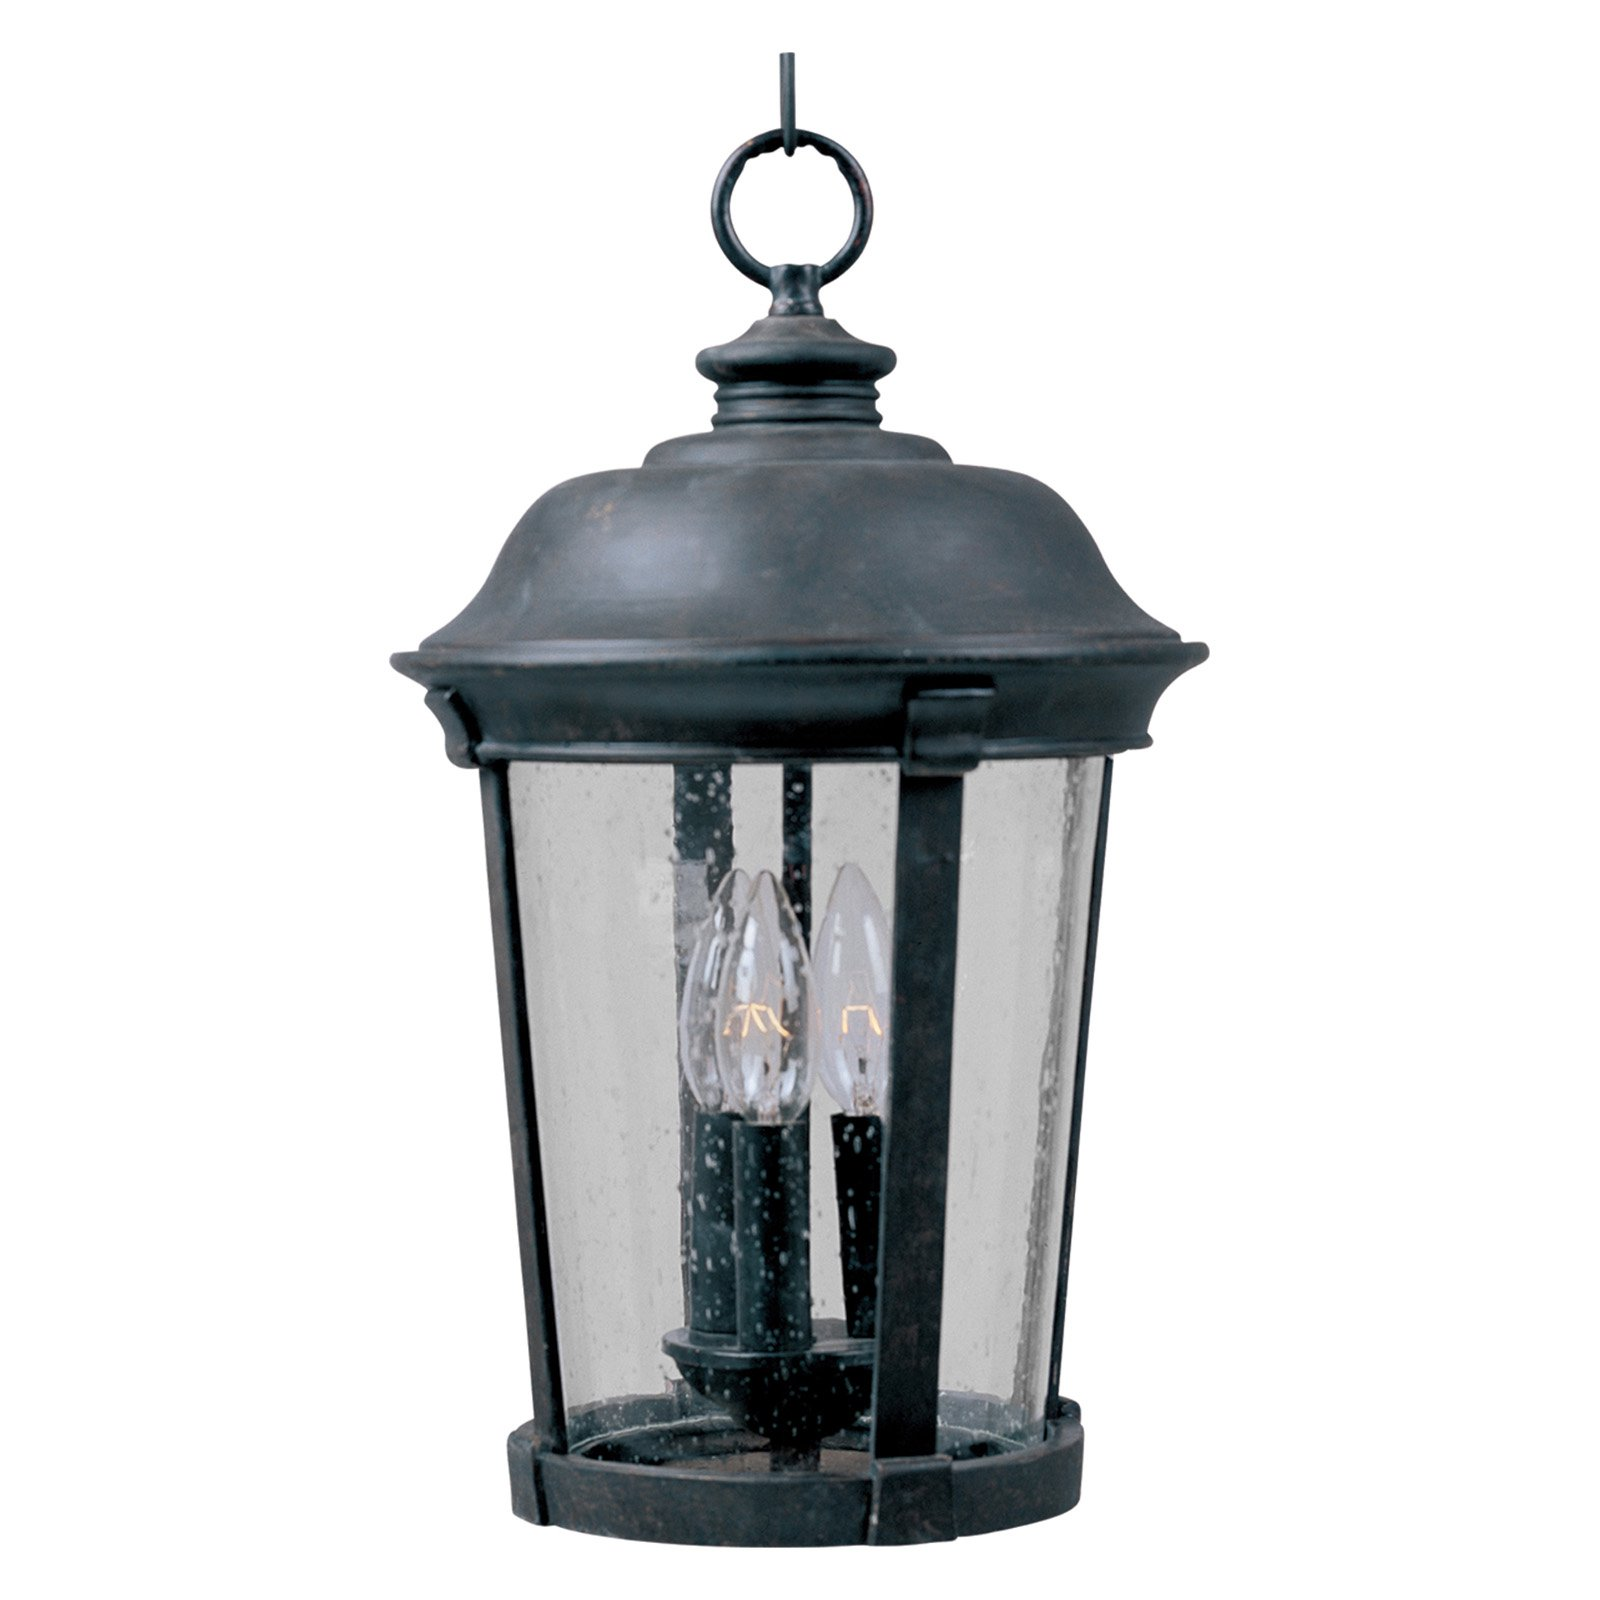 Maxim Dover DC Outdoor Hanging Lantern 20H in. Bronze by Maxim